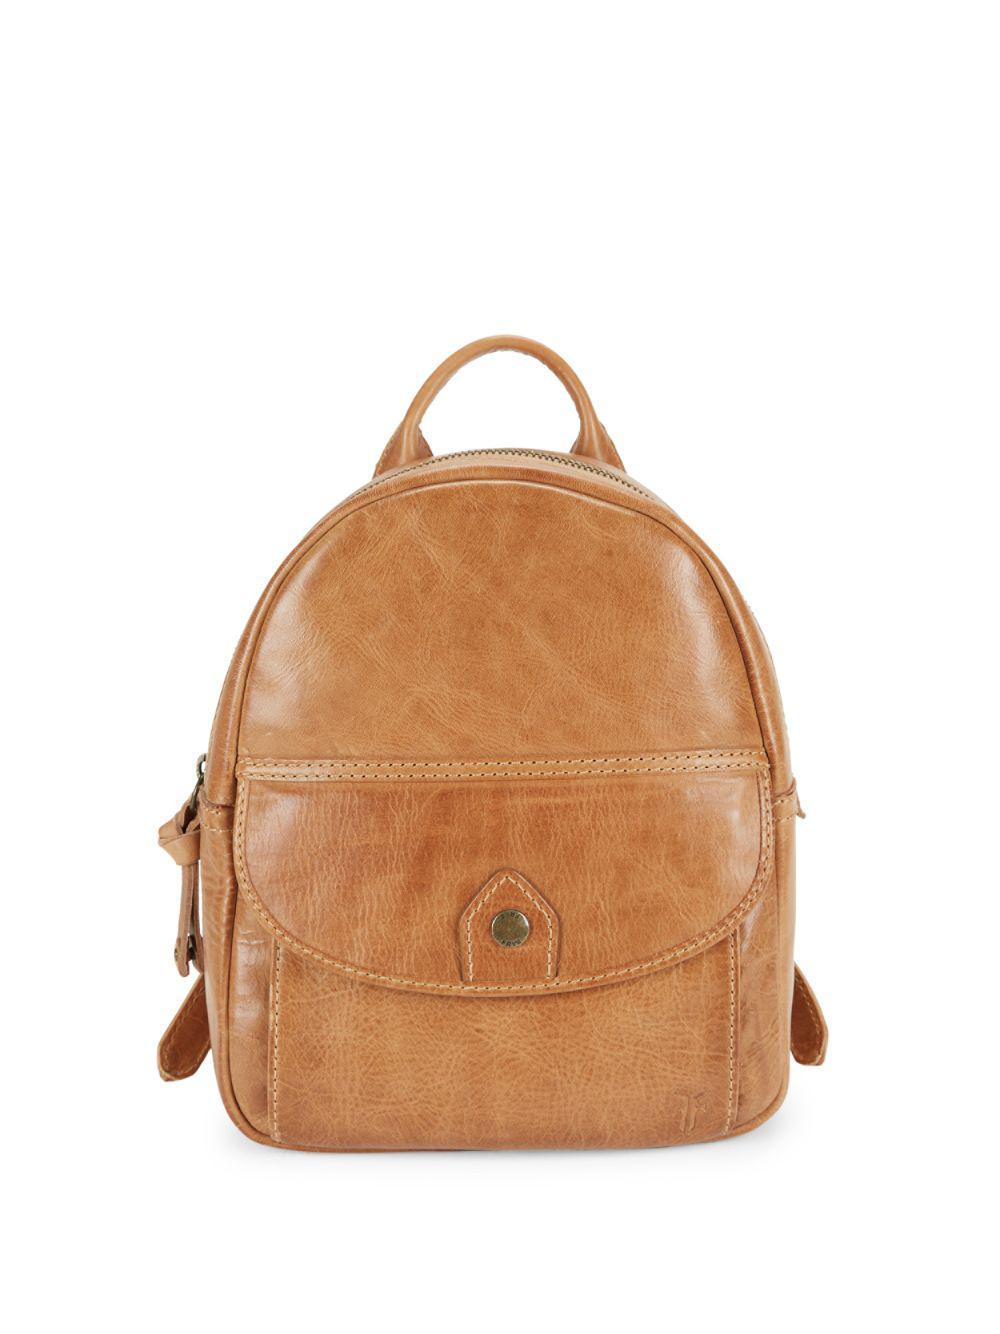 53be55d298 Frye Melissa Mini Backpack in Brown - Lyst